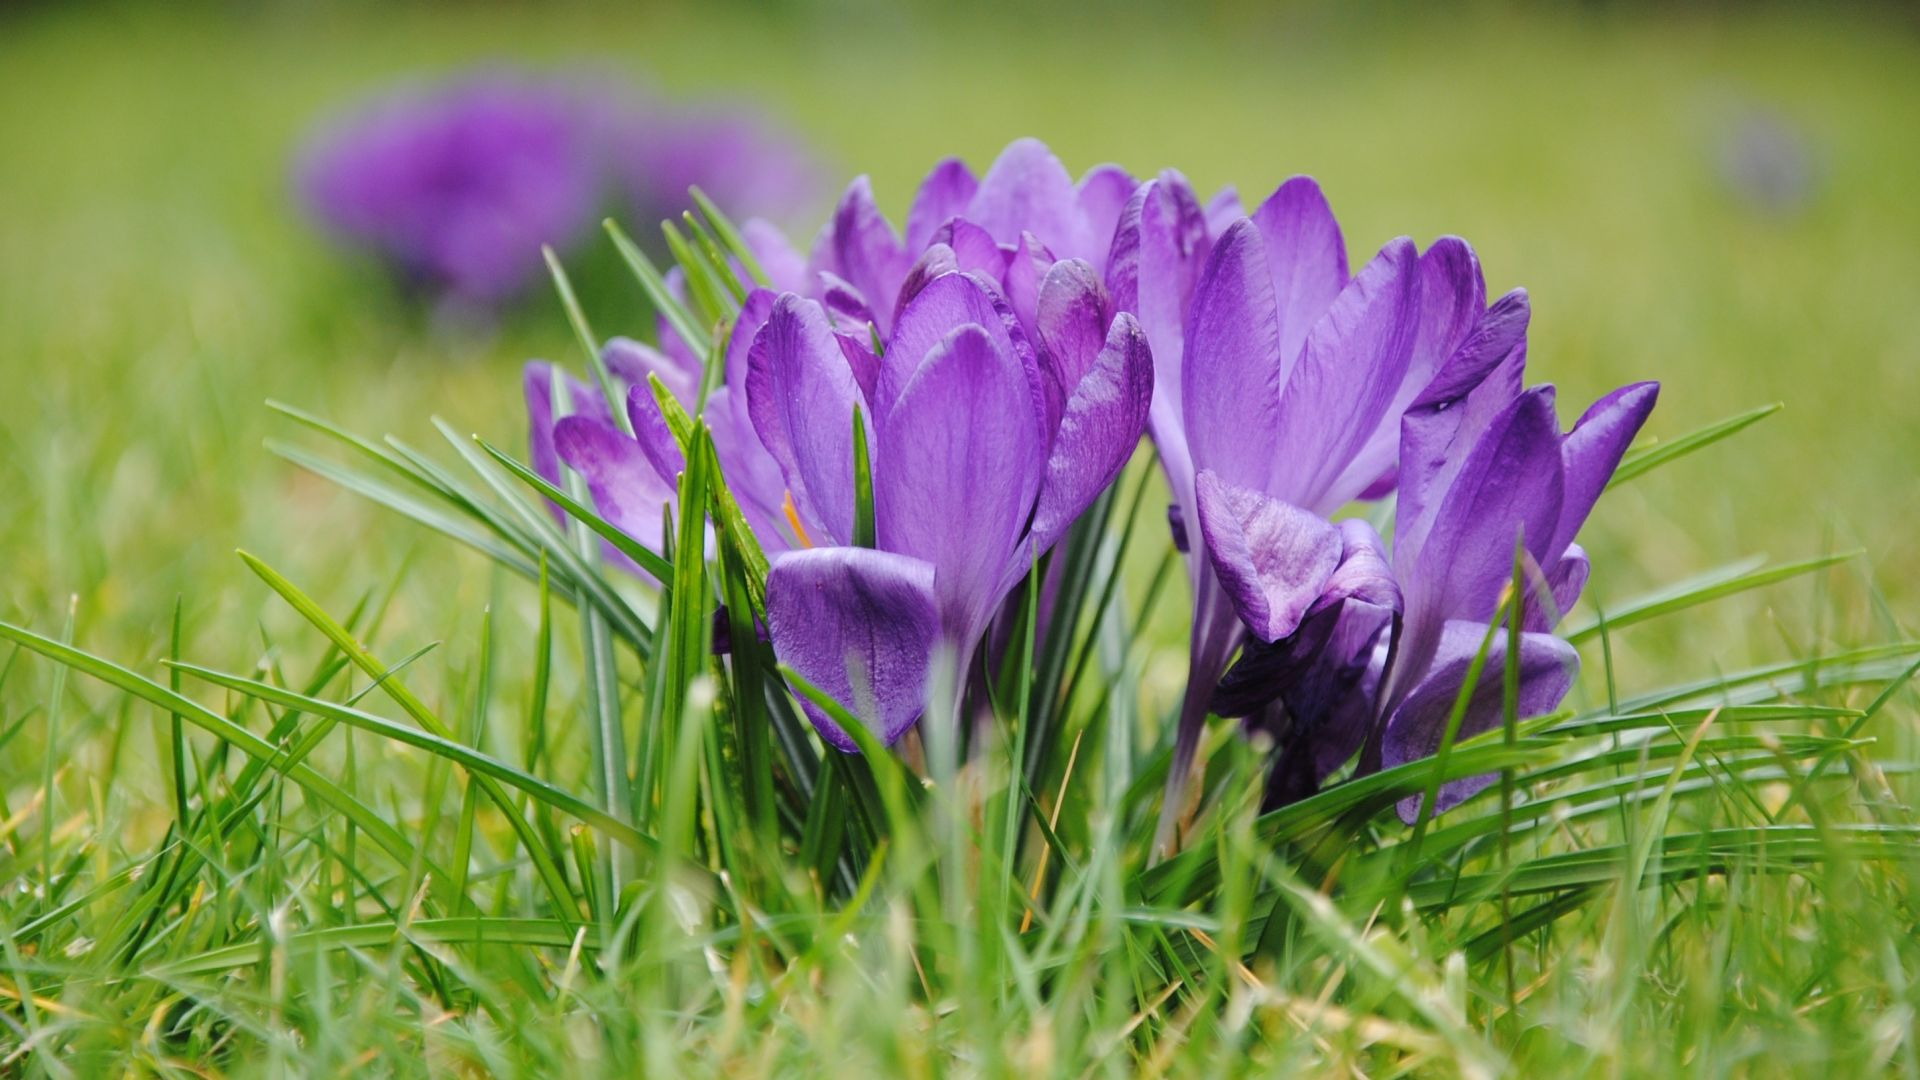 Wallpaper Purple crocus, flowers, grass, bloom